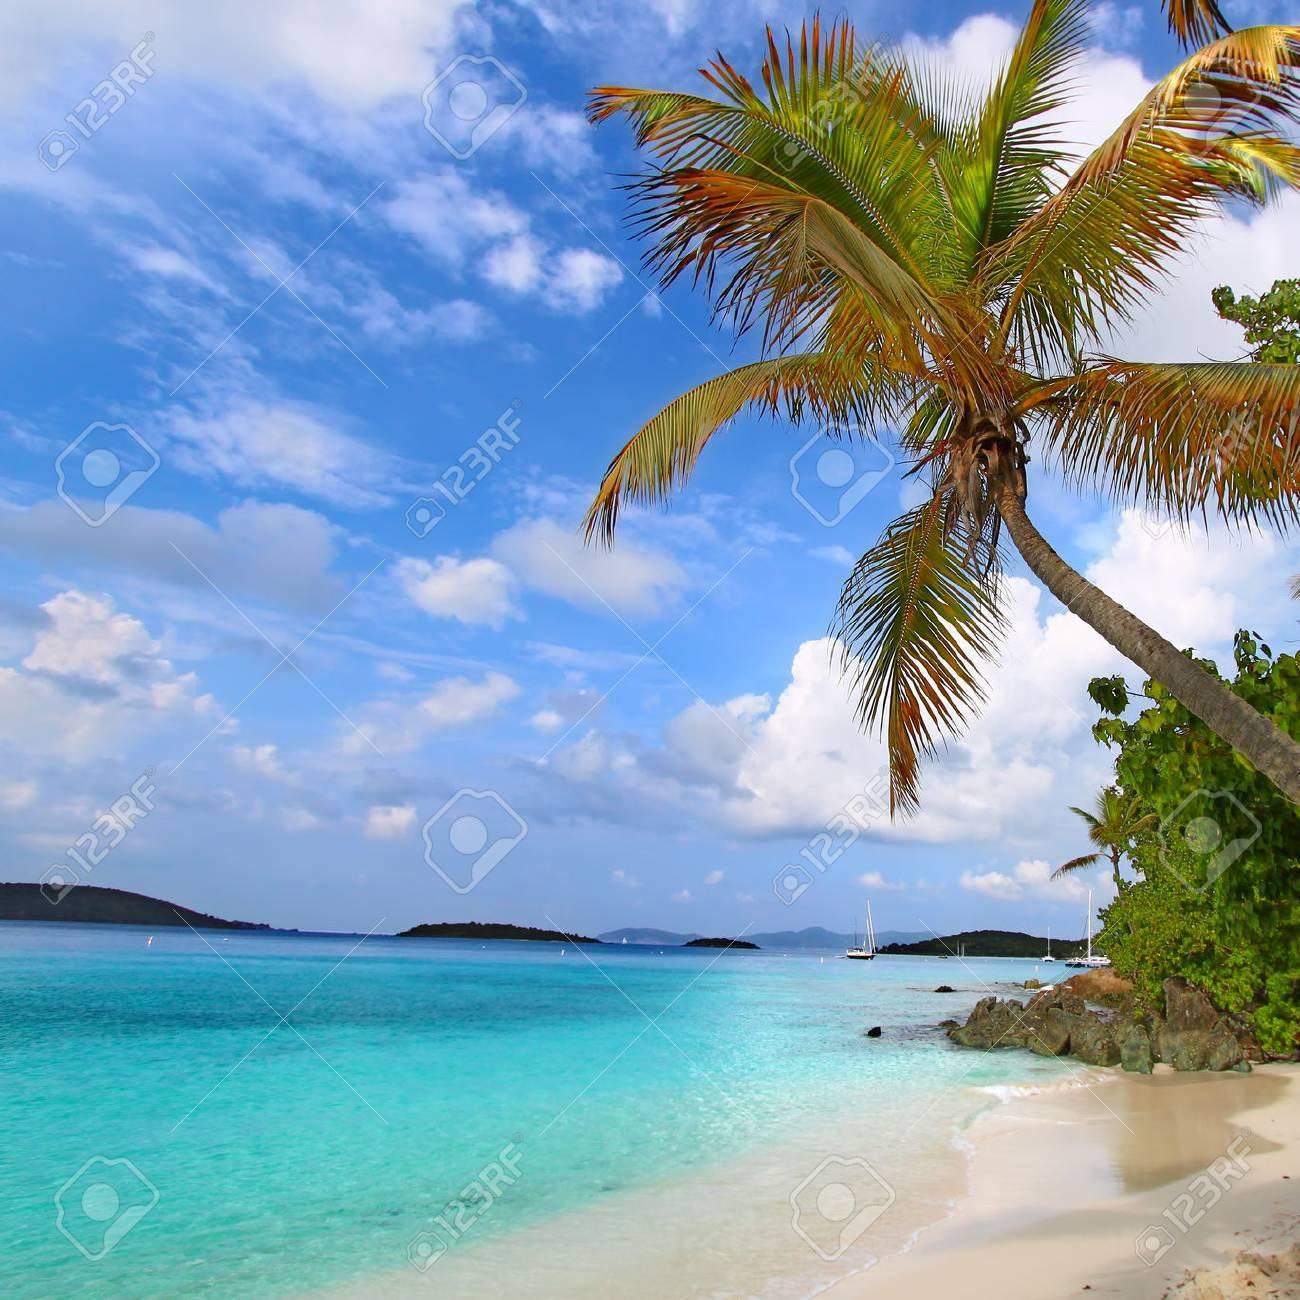 Palm tree over the beach of Saint John in the US Virgin Islands Stock Photo - 23461959